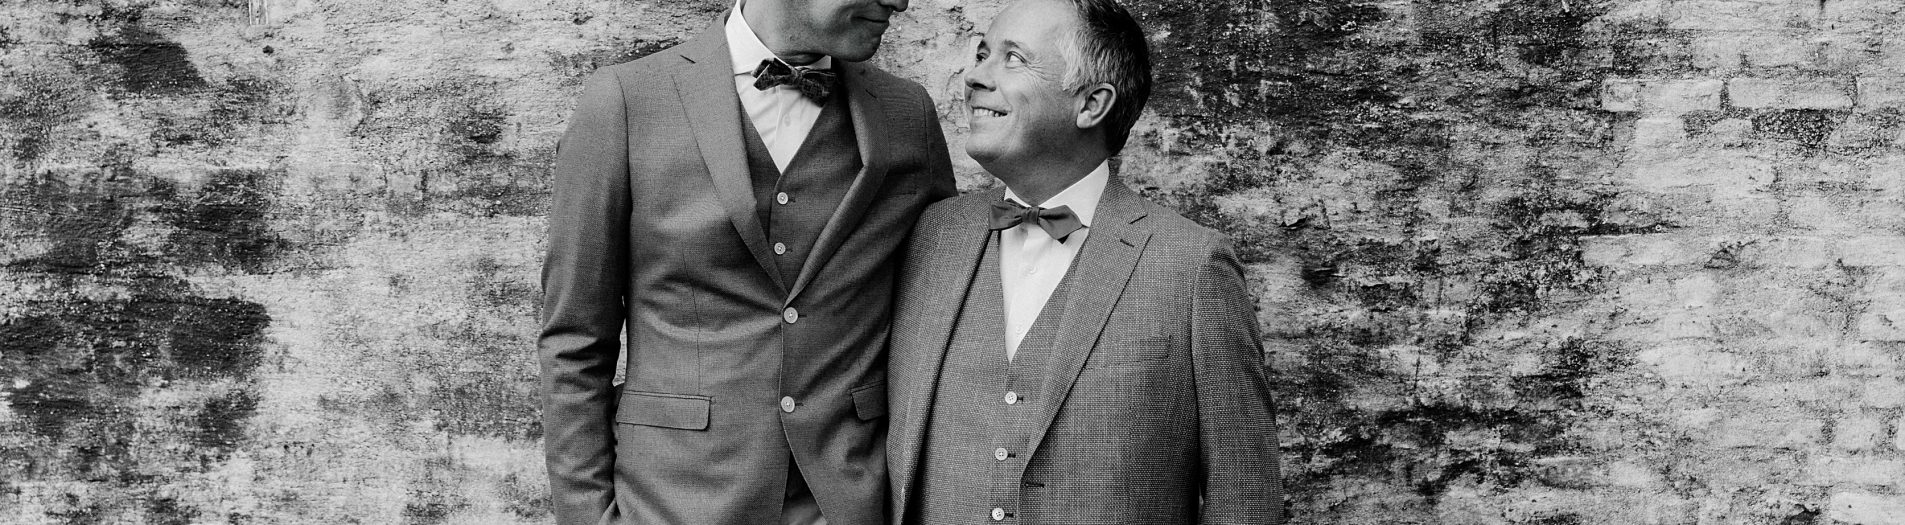 Same-sex wedding   LGBT bruidsreportage